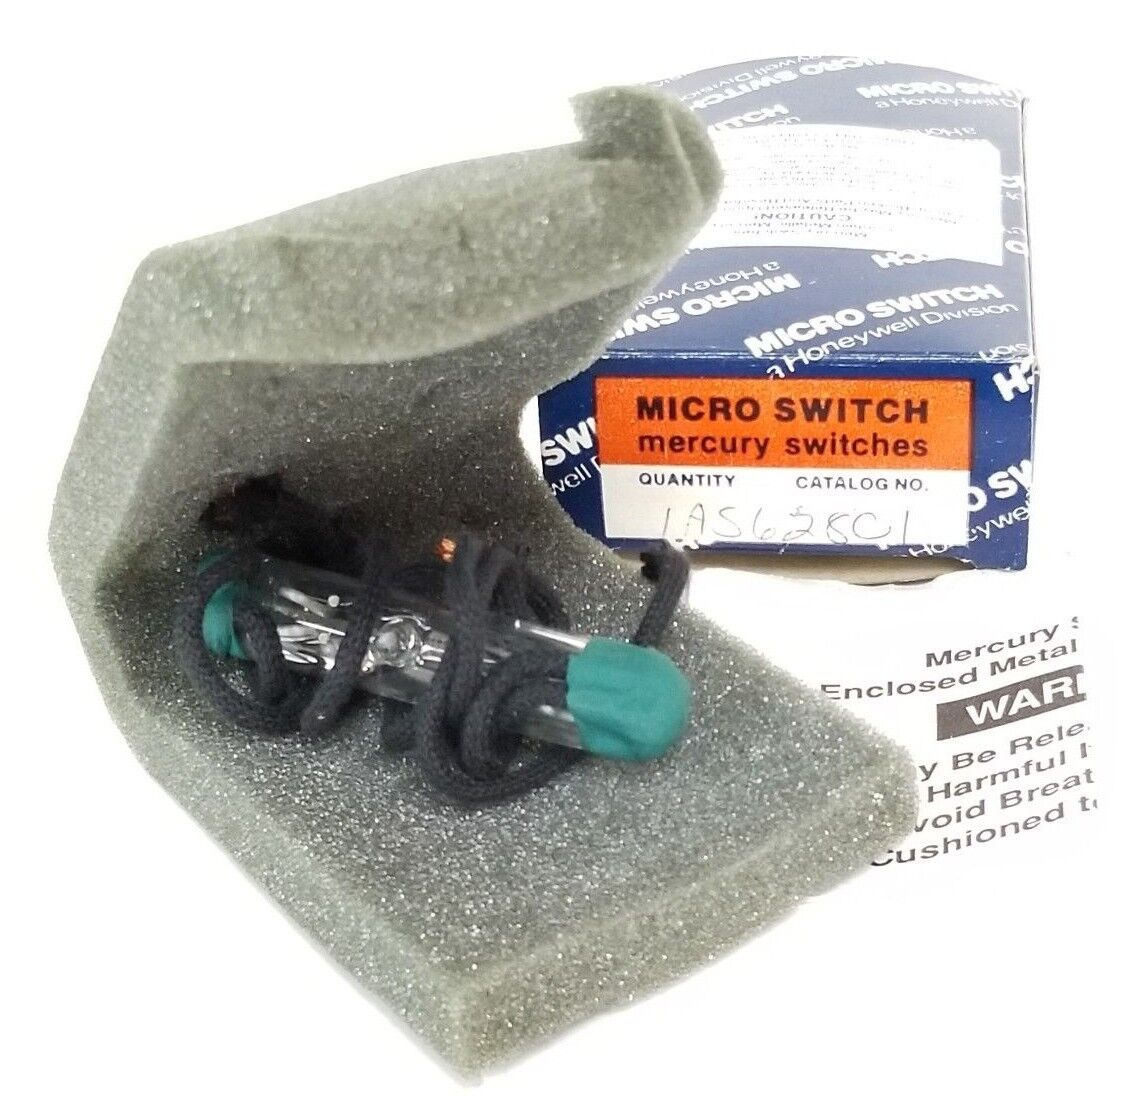 NIB HONEYWELL MICRO SWITCH AS628C1 MERCURY SWITCH 10-91, 1AS628C1